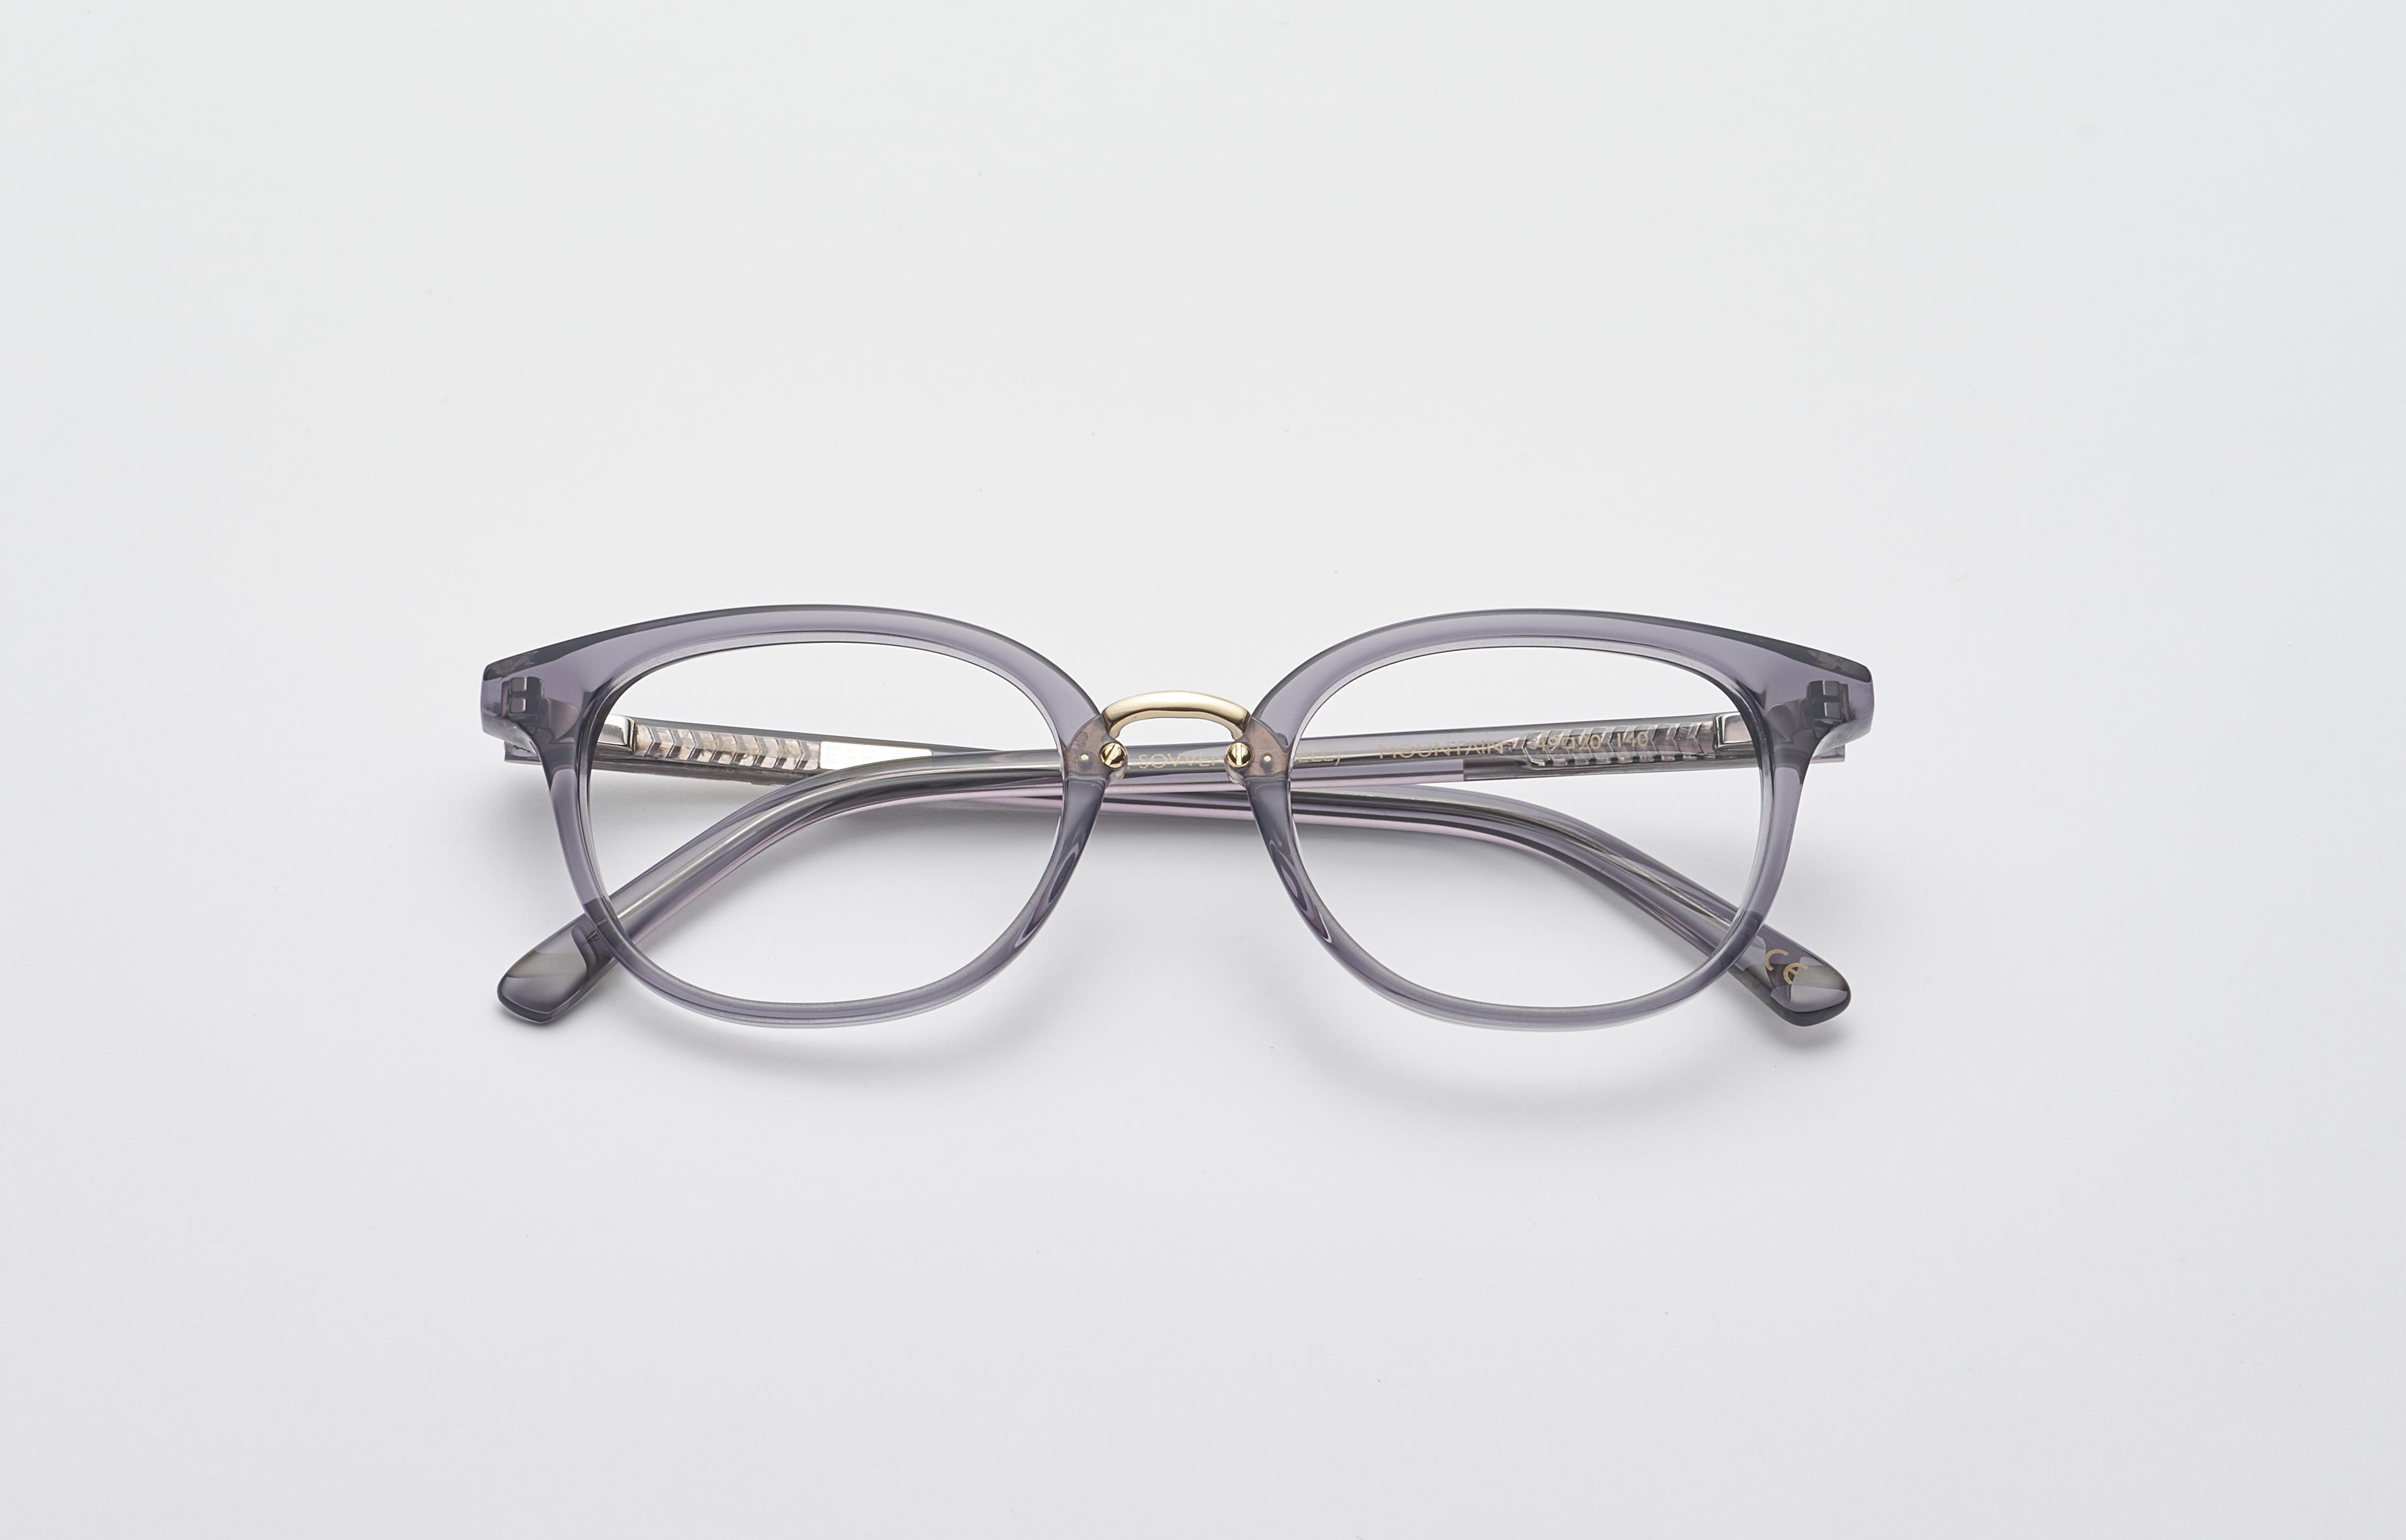 b82c7a3b7962 Digkie-Sovvene (Diksele) 49 Mountain - EOE Eyewear